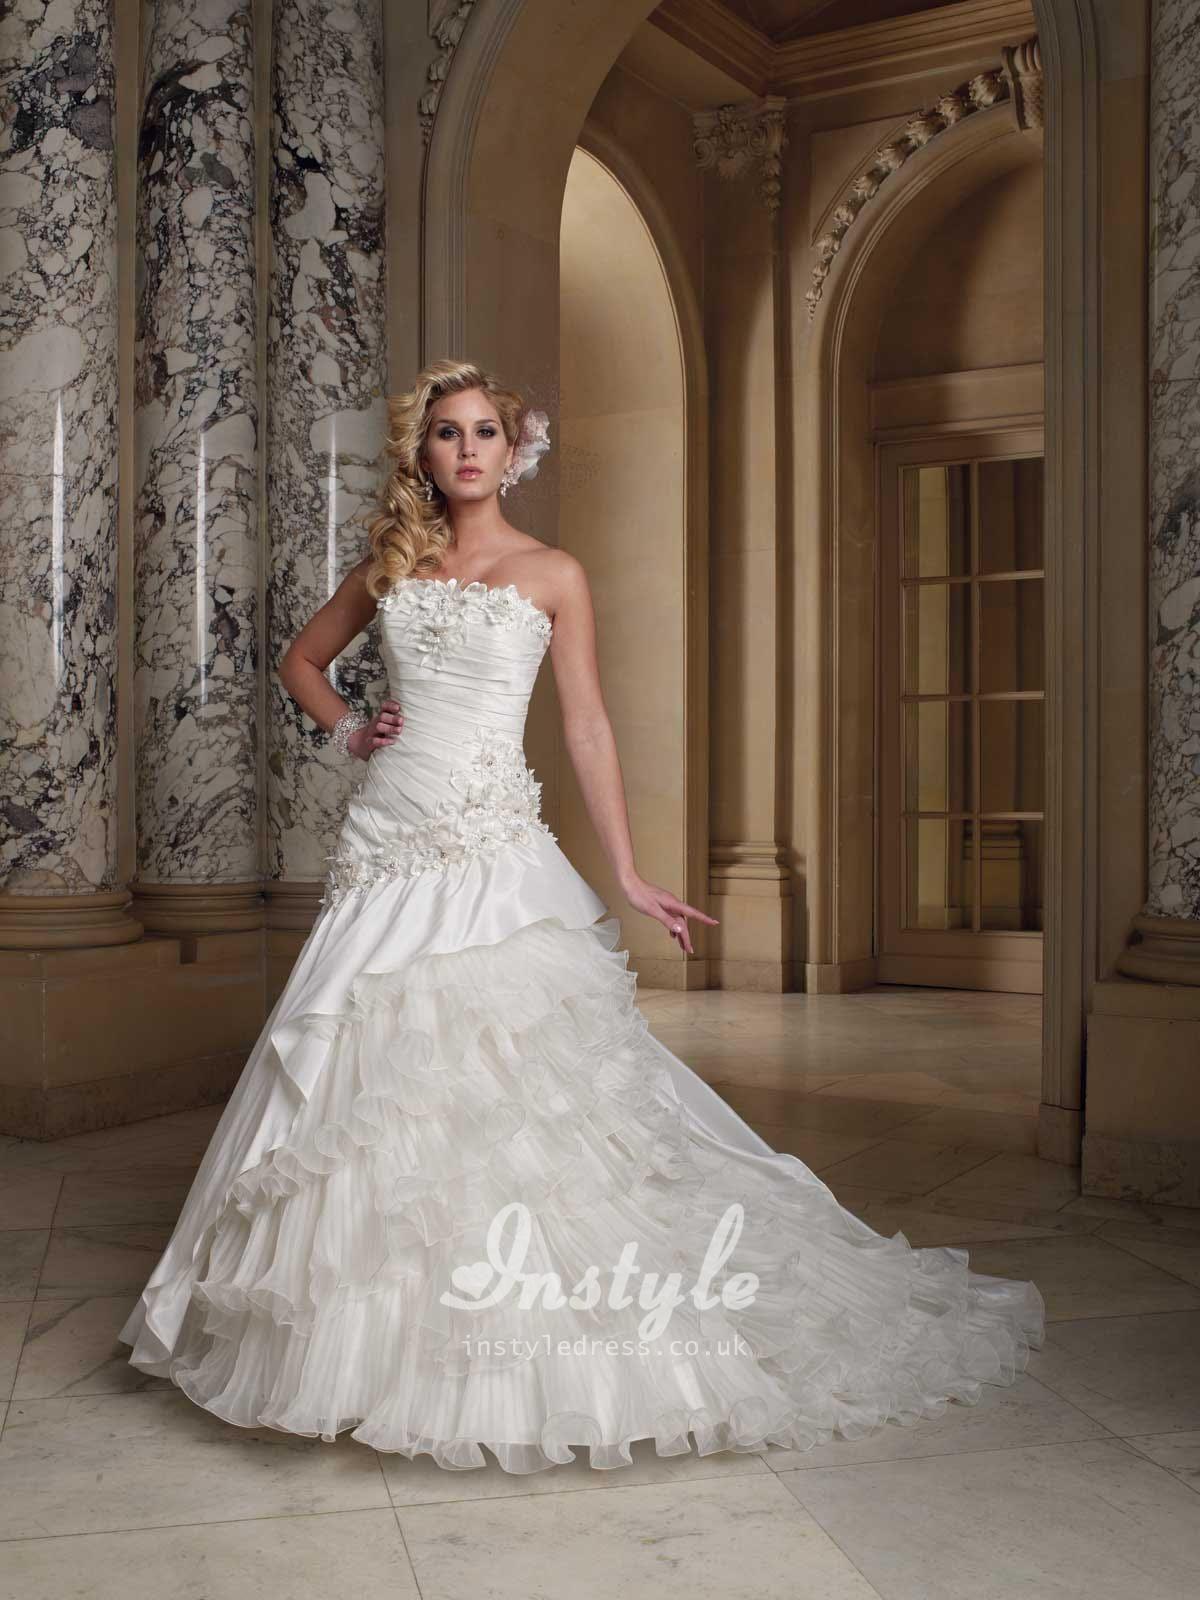 Asymmetrically Tiered Ball Gown Wedding Dress Uk Ball Gown Wedding Dress Wedding Dresses Wedding Dresses Taffeta,Fall Wedding Guest Dresses 2020 Amazon